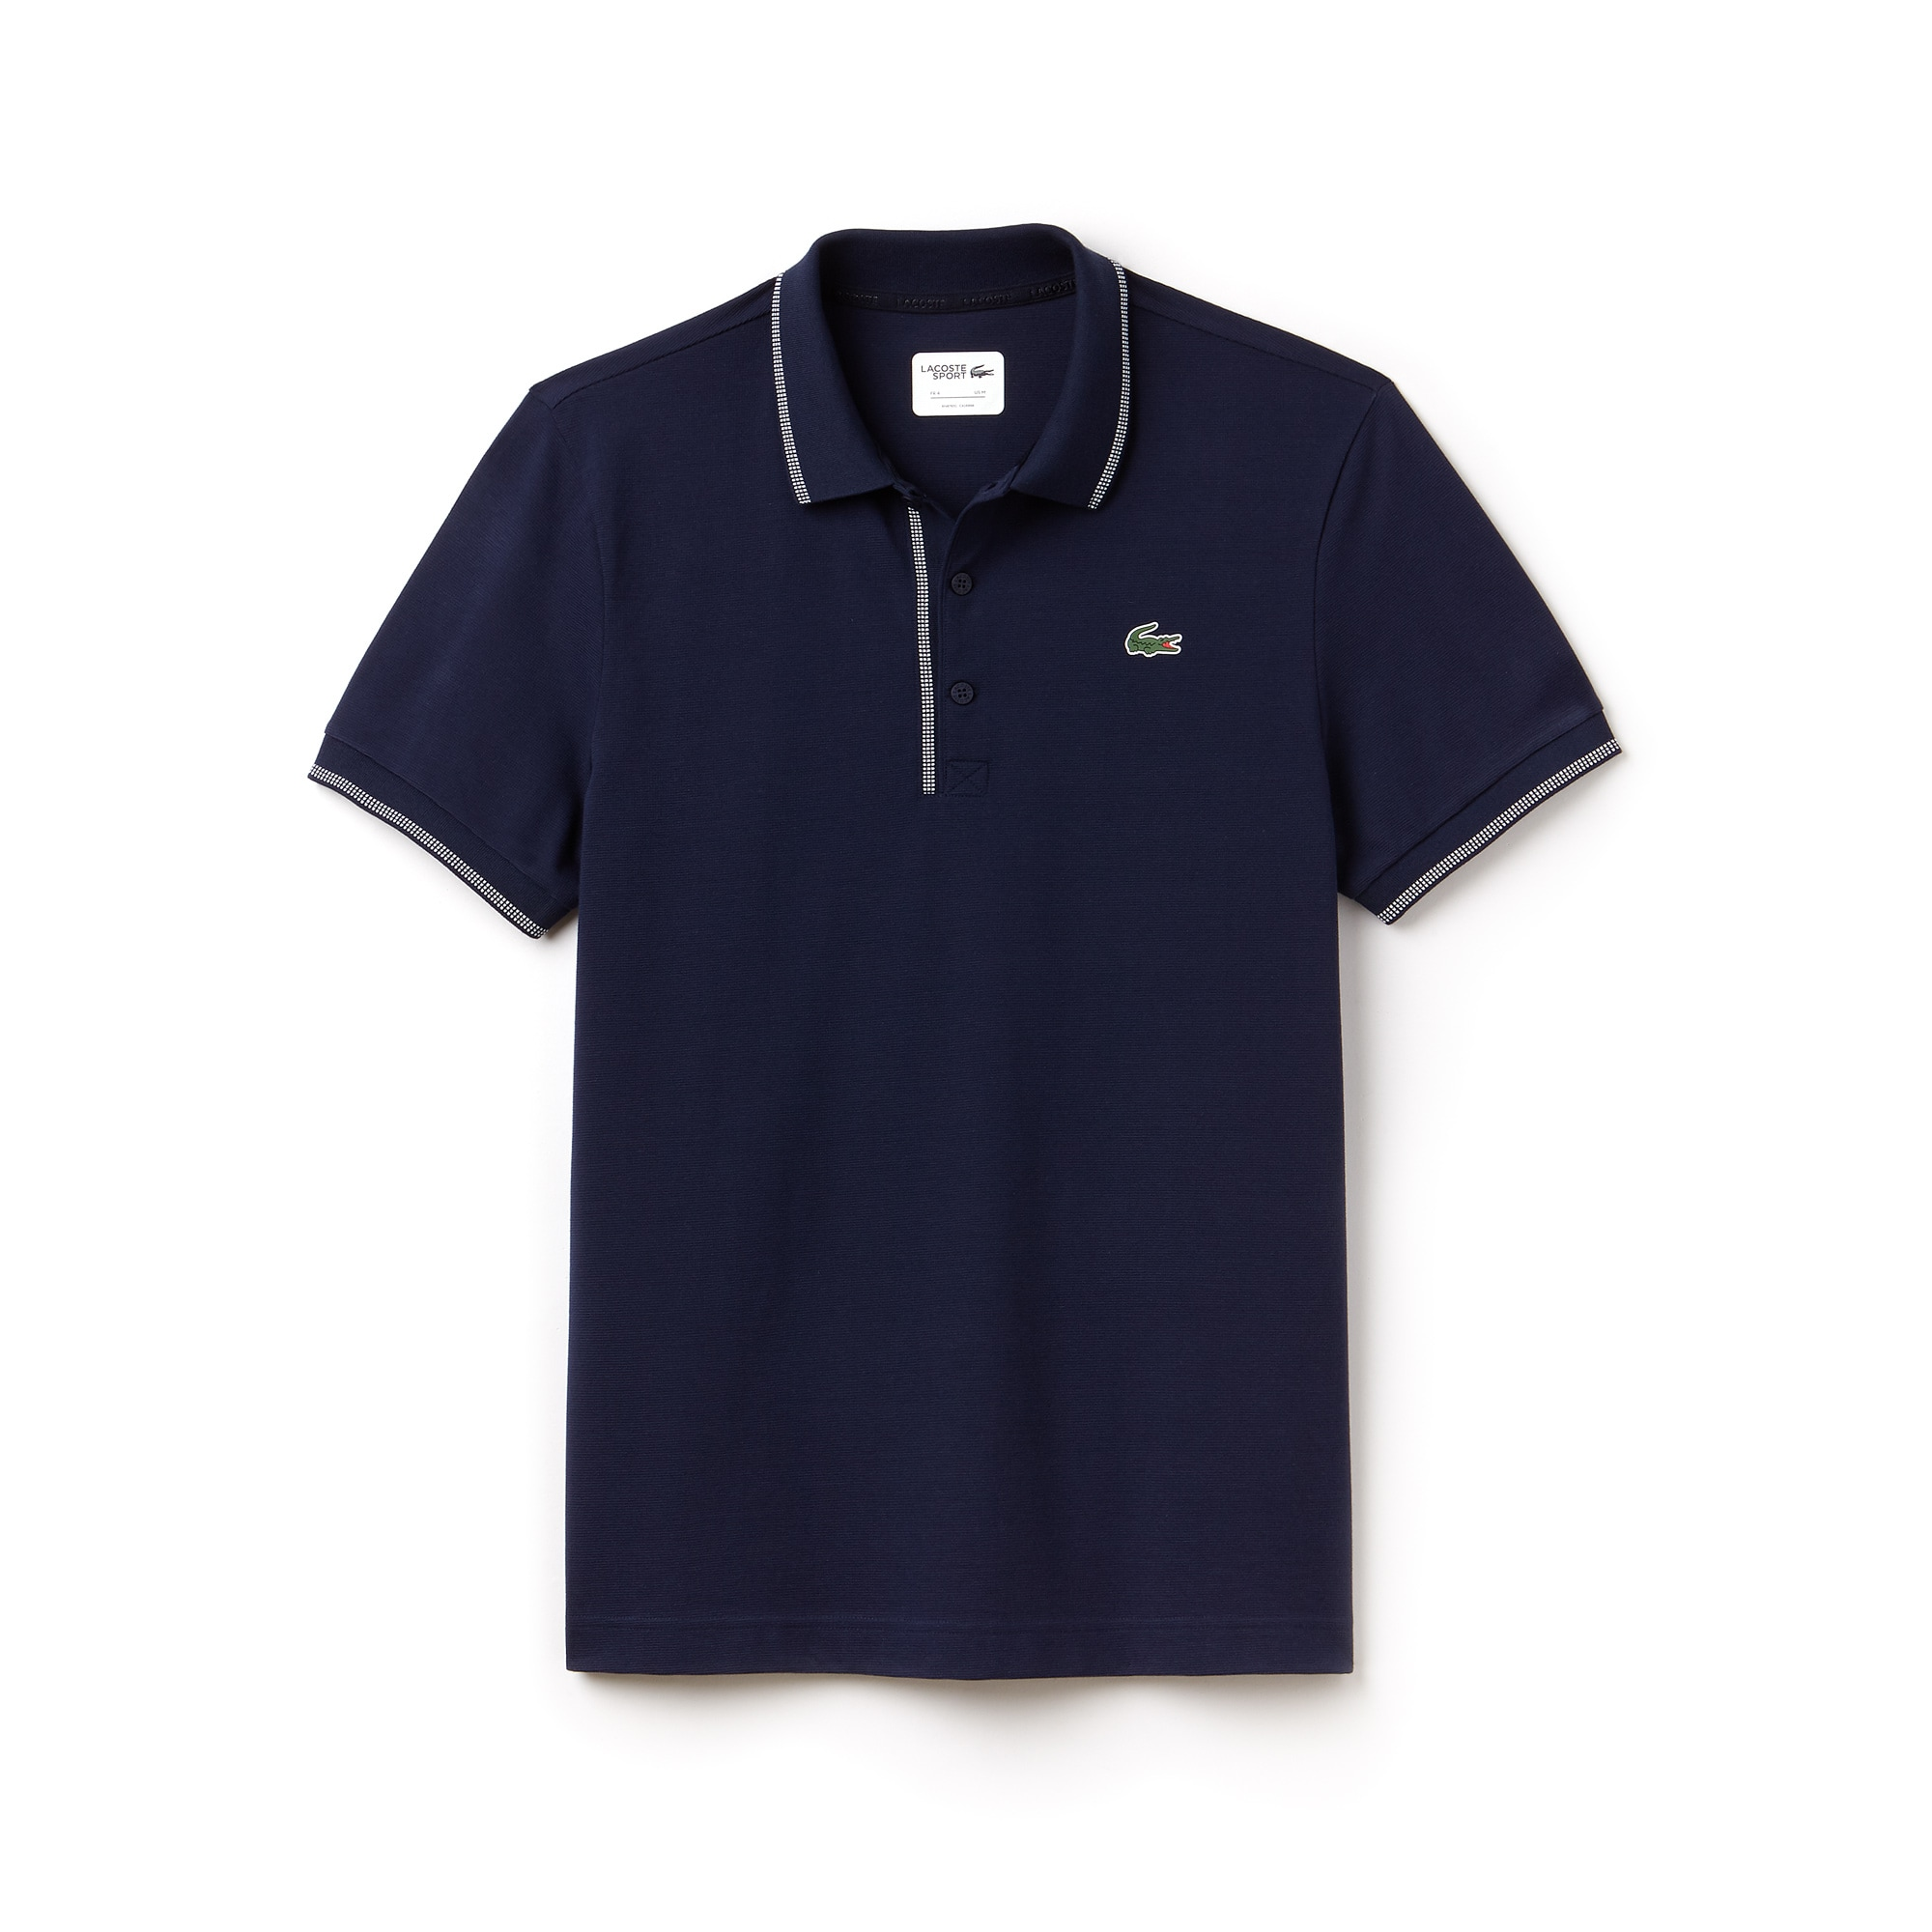 Men's Lacoste SPORT Piped Ultra-Light Cotton Golf Polo